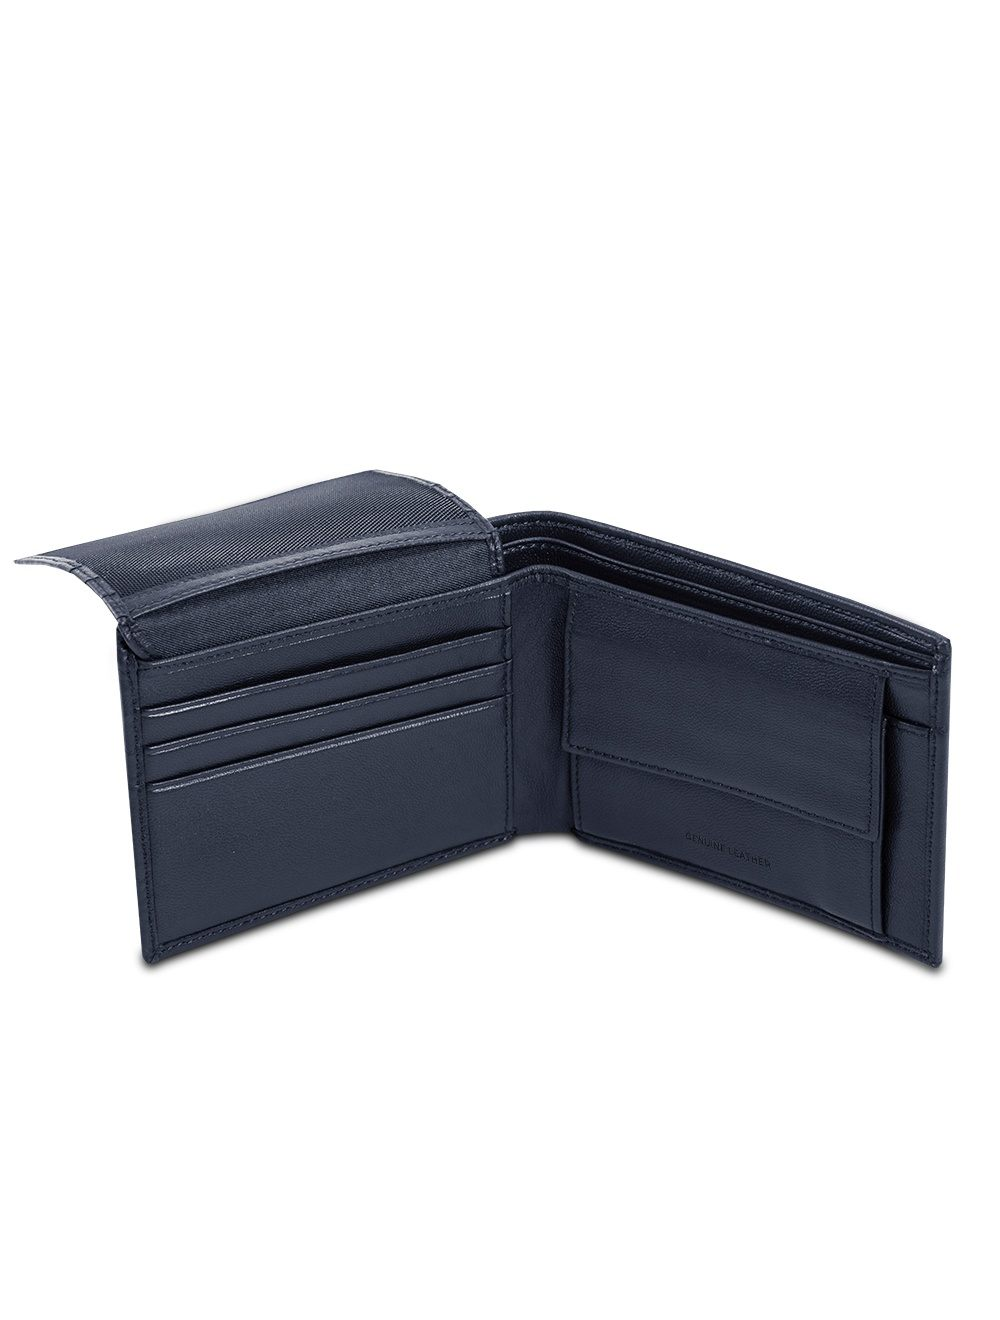 Classic Coin Wallet - Ocean Blue